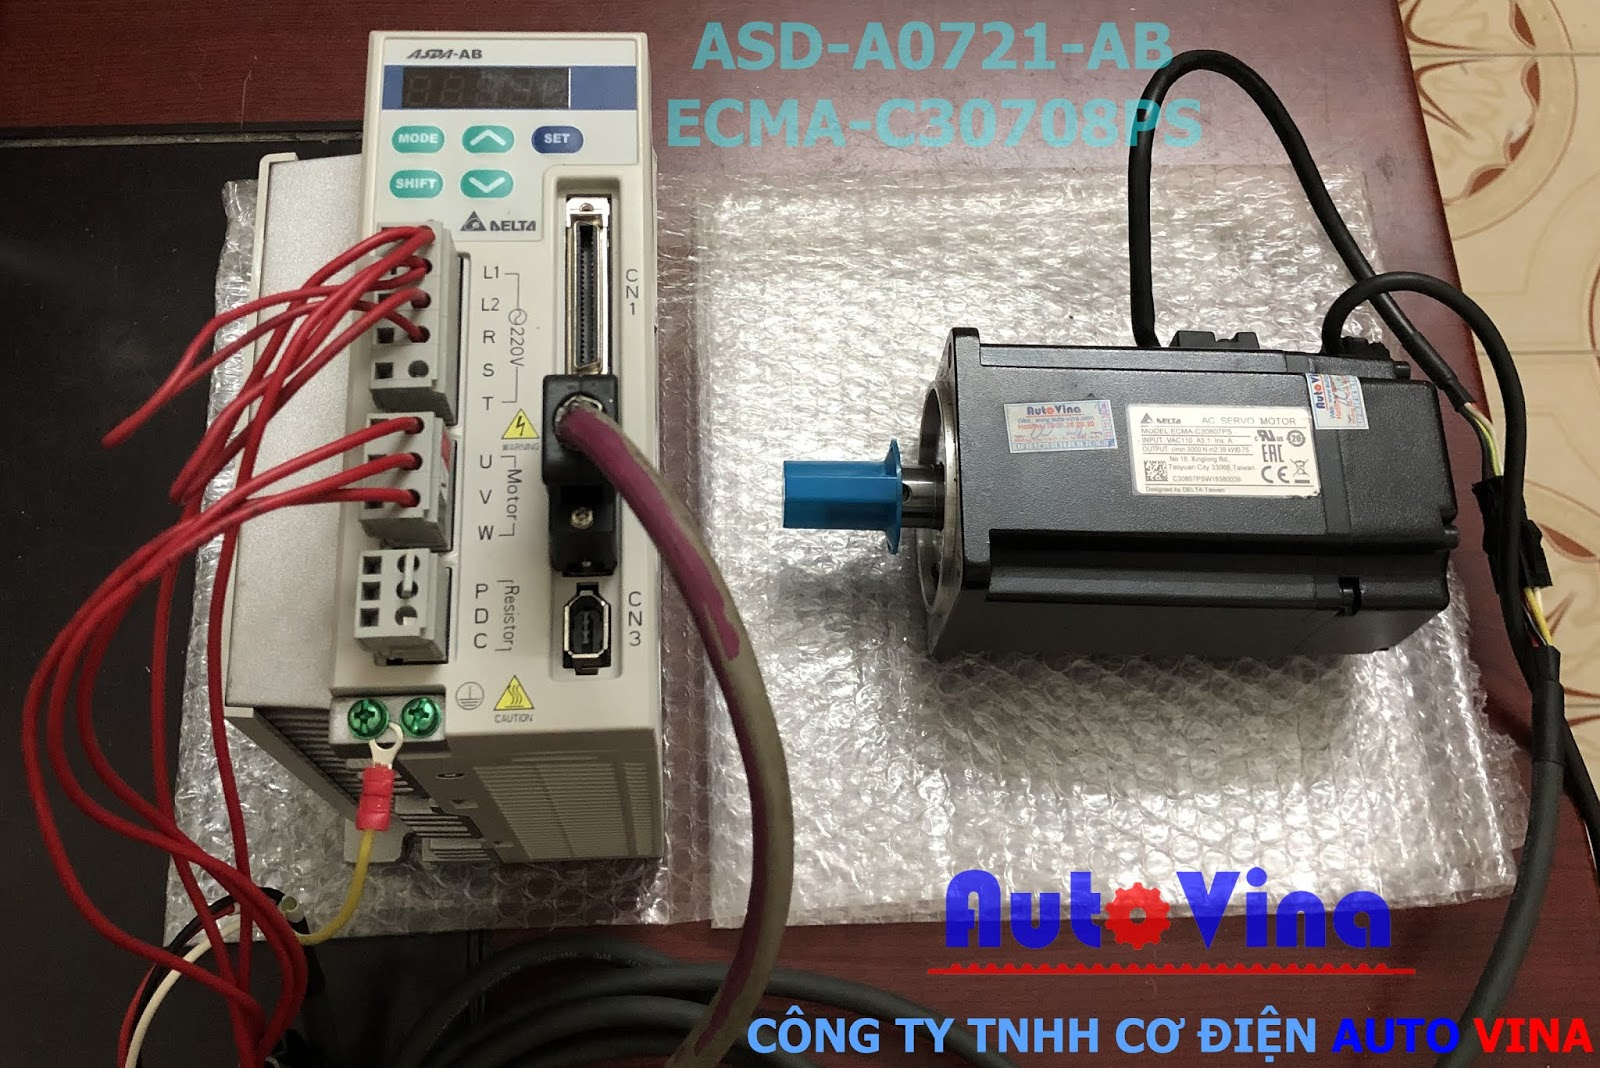 Hướng dẫn cài đặt và chạy jog bộ servo Delta ASD-A0721-AB, servo Motor ECMA-C30807PS